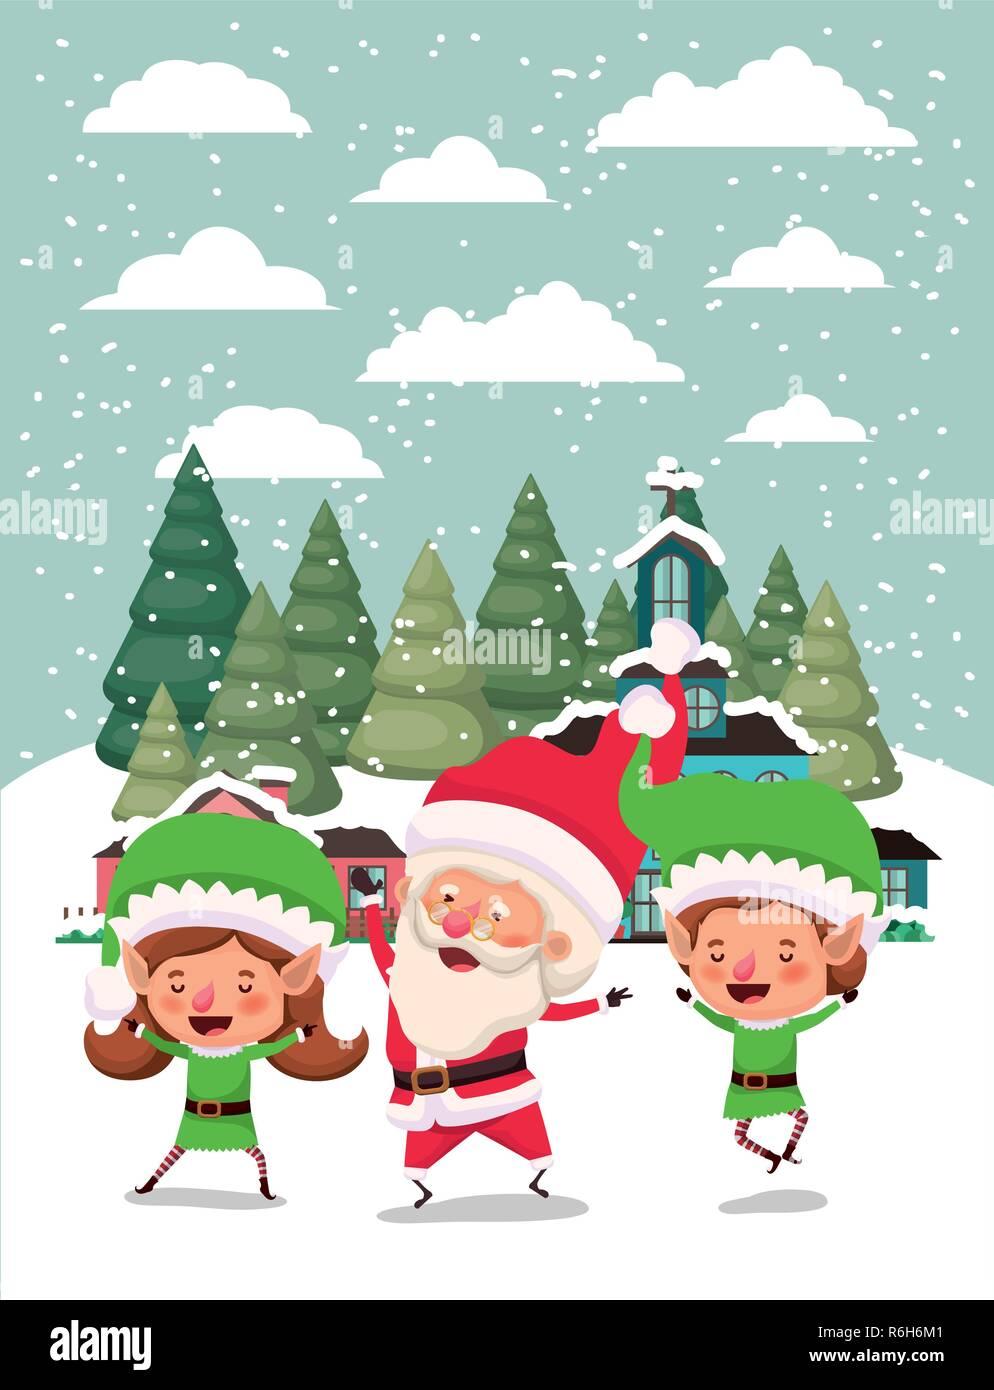 Elfs Stock Photos & Elfs Stock Images